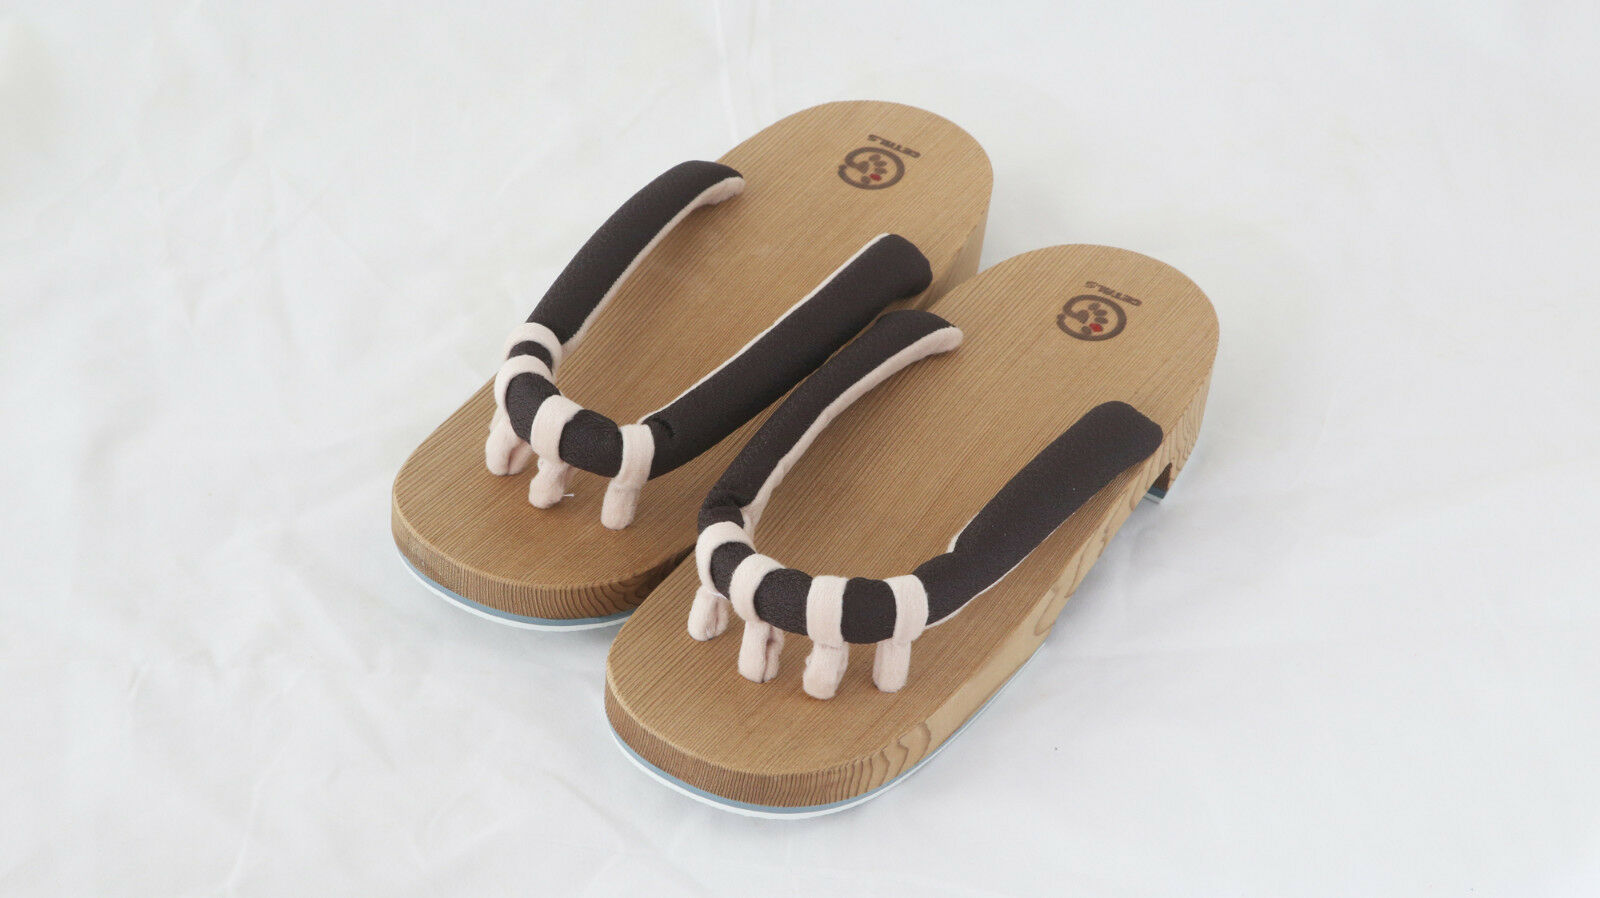 GETALS represent a brand new type of of of geta sandals 7aaa3d